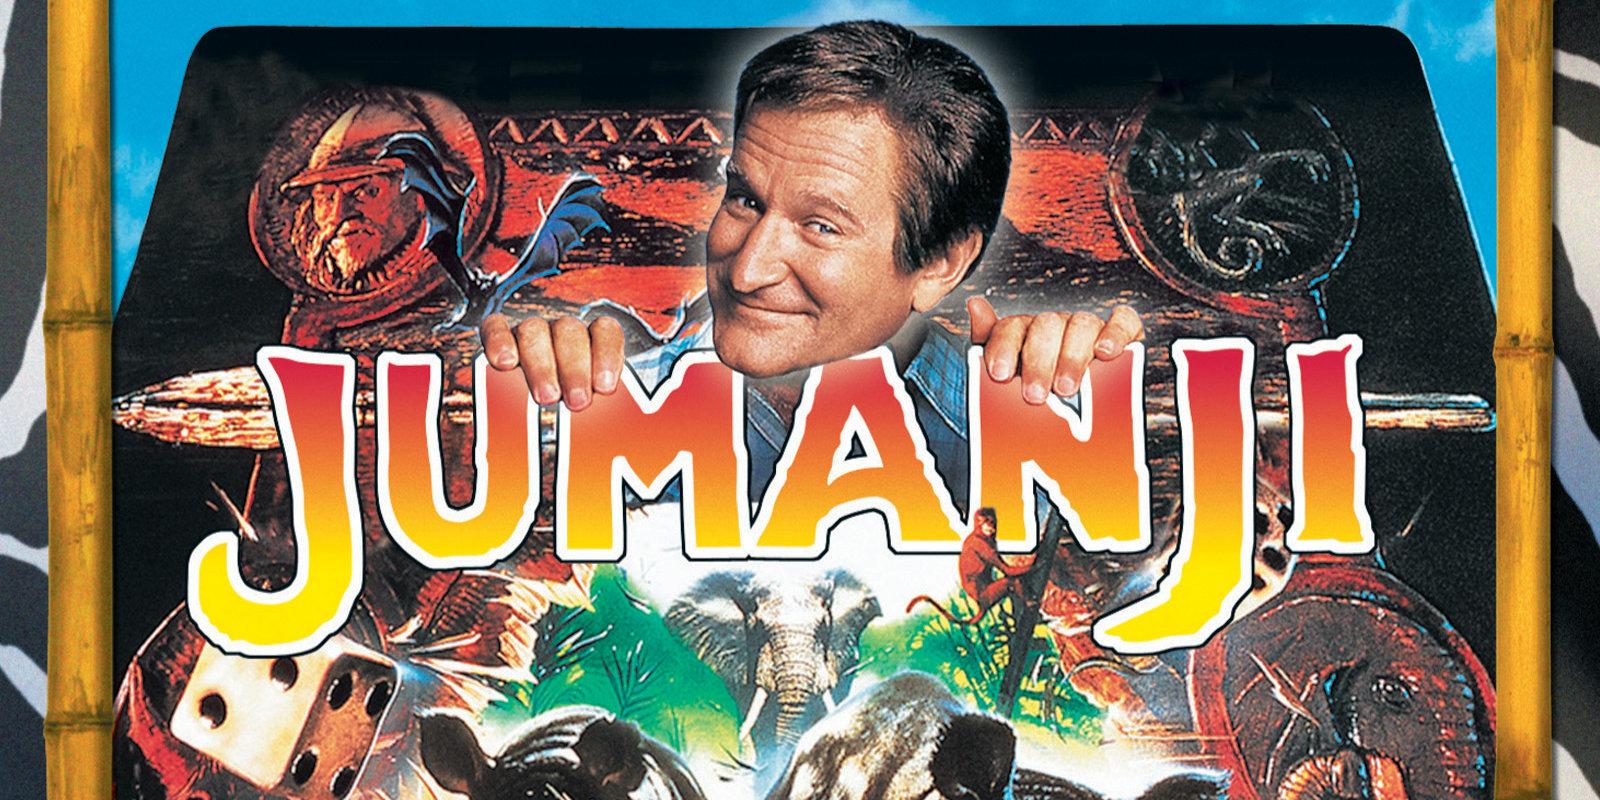 Robin Williams Jumanji How Jumanji 2 Honors R...